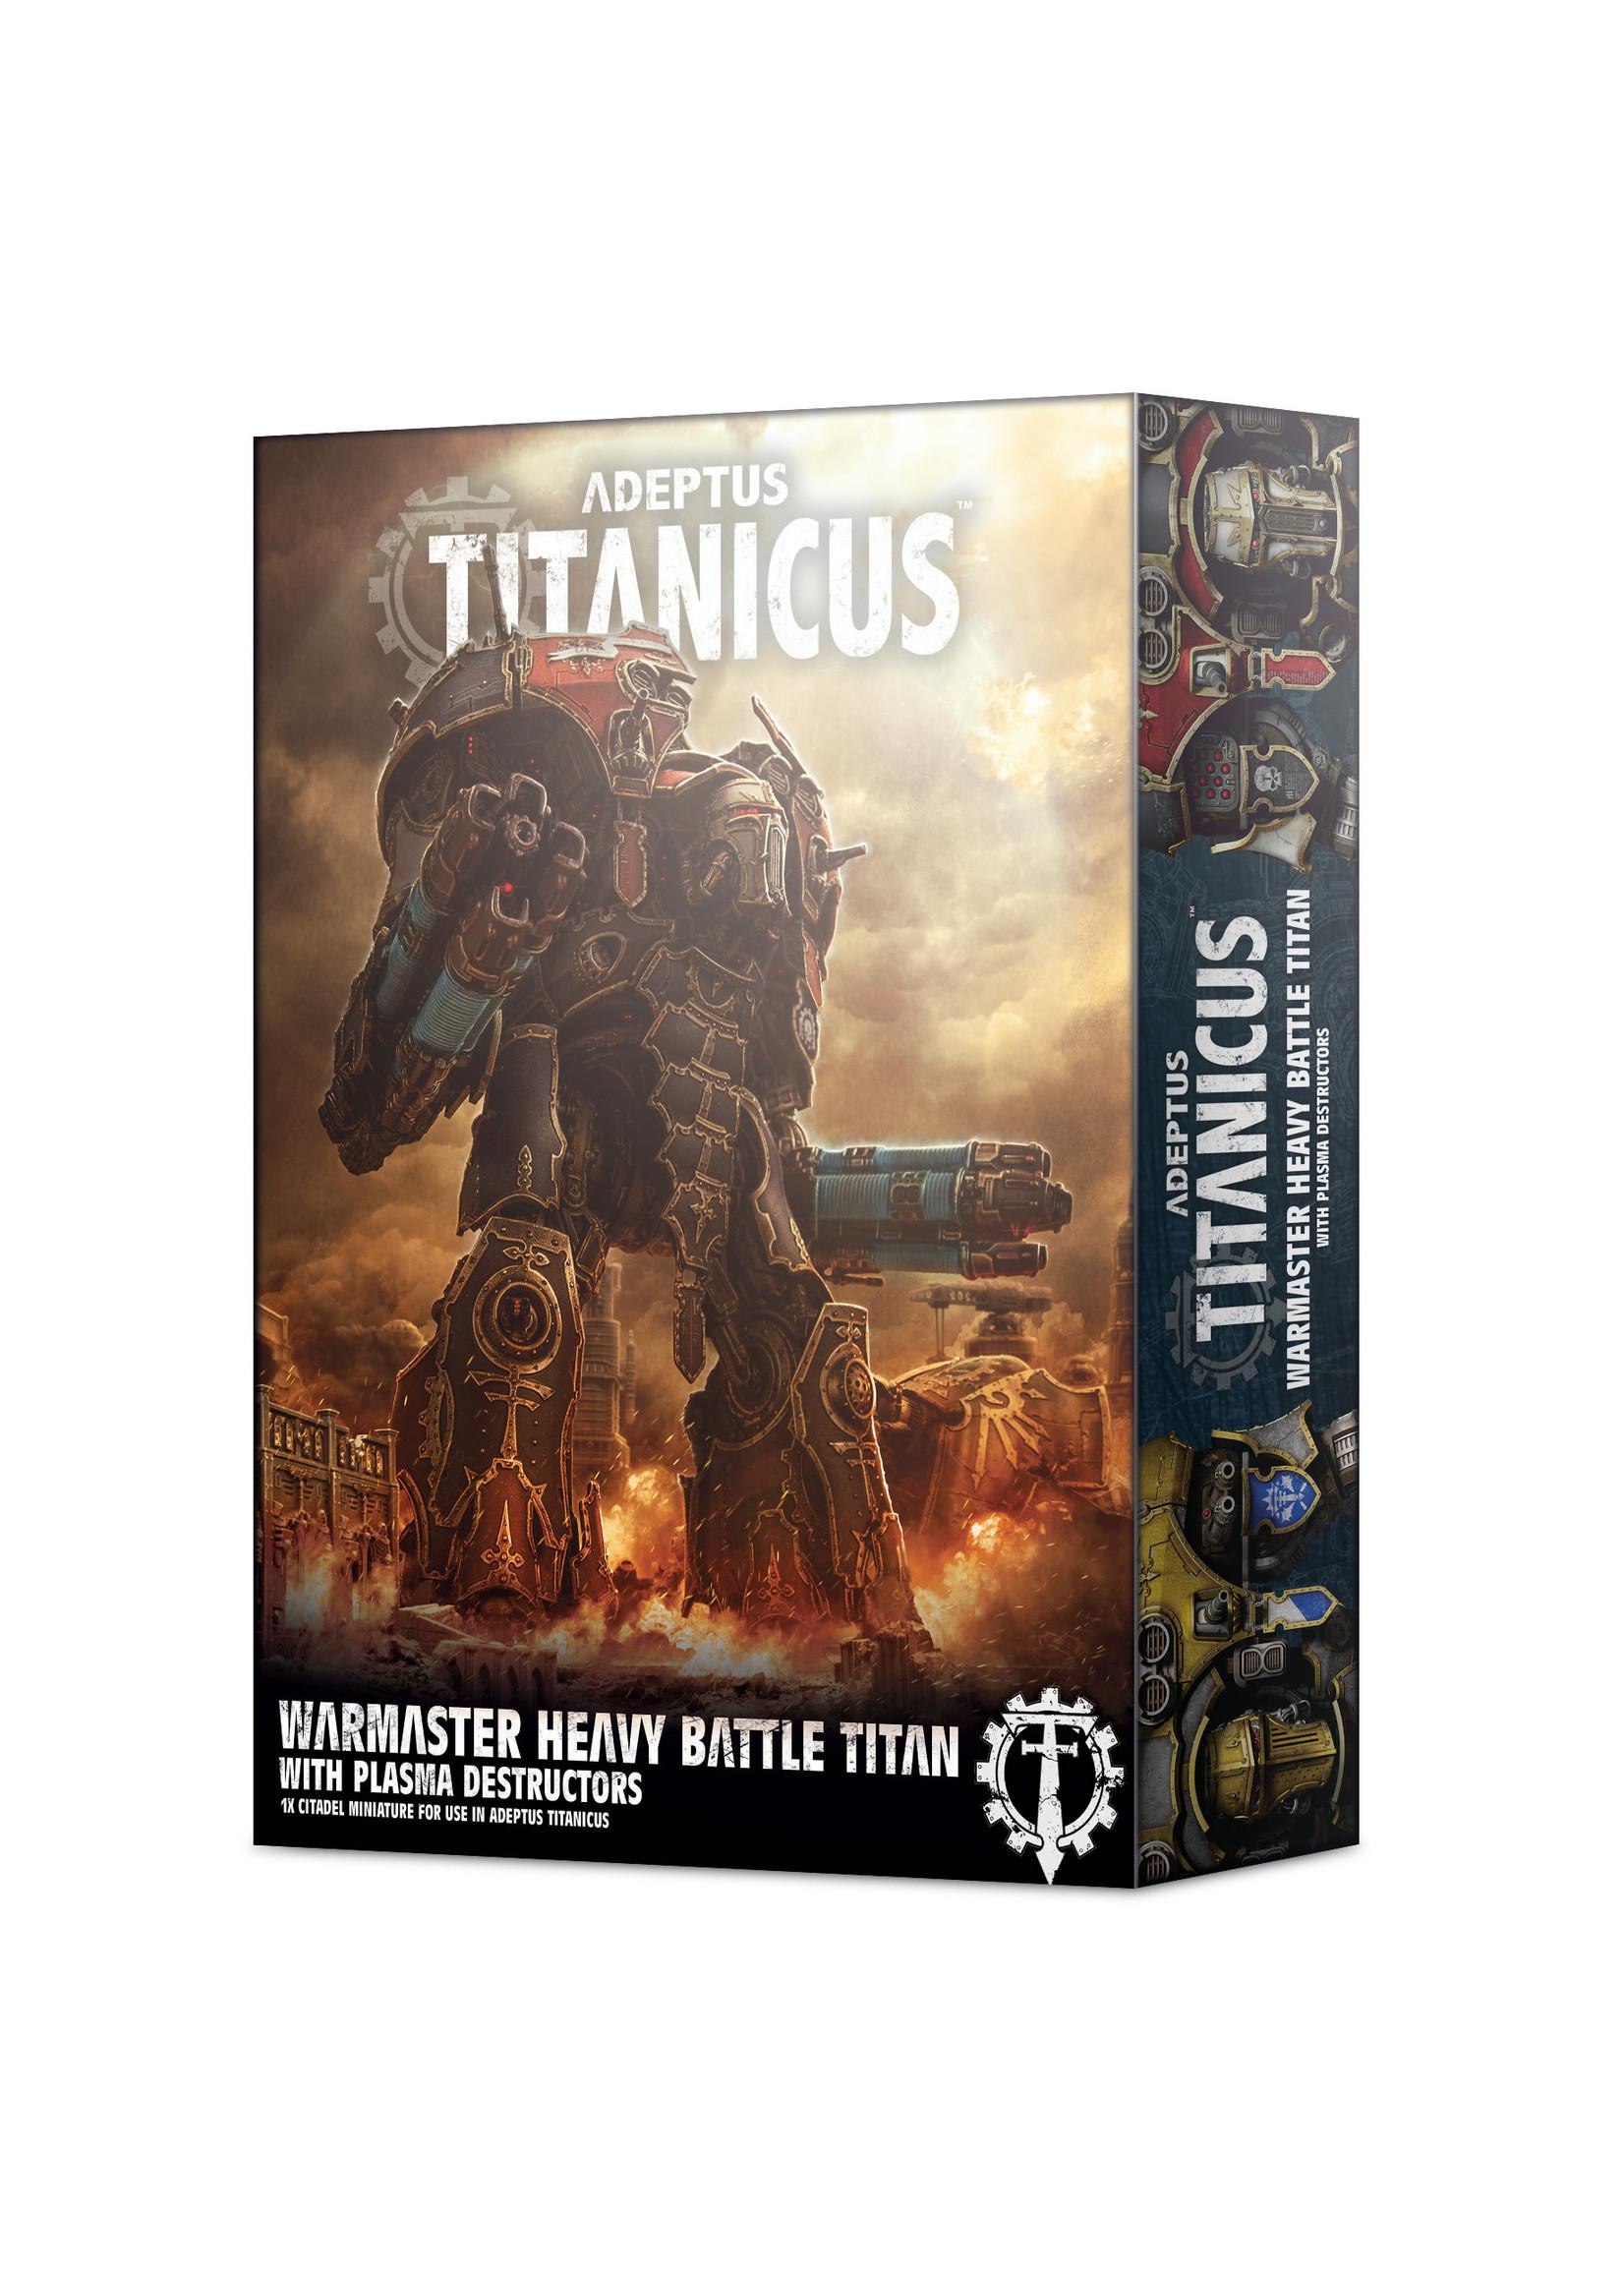 Adeptus Tanicus Warmaster Heavy Battle Titan